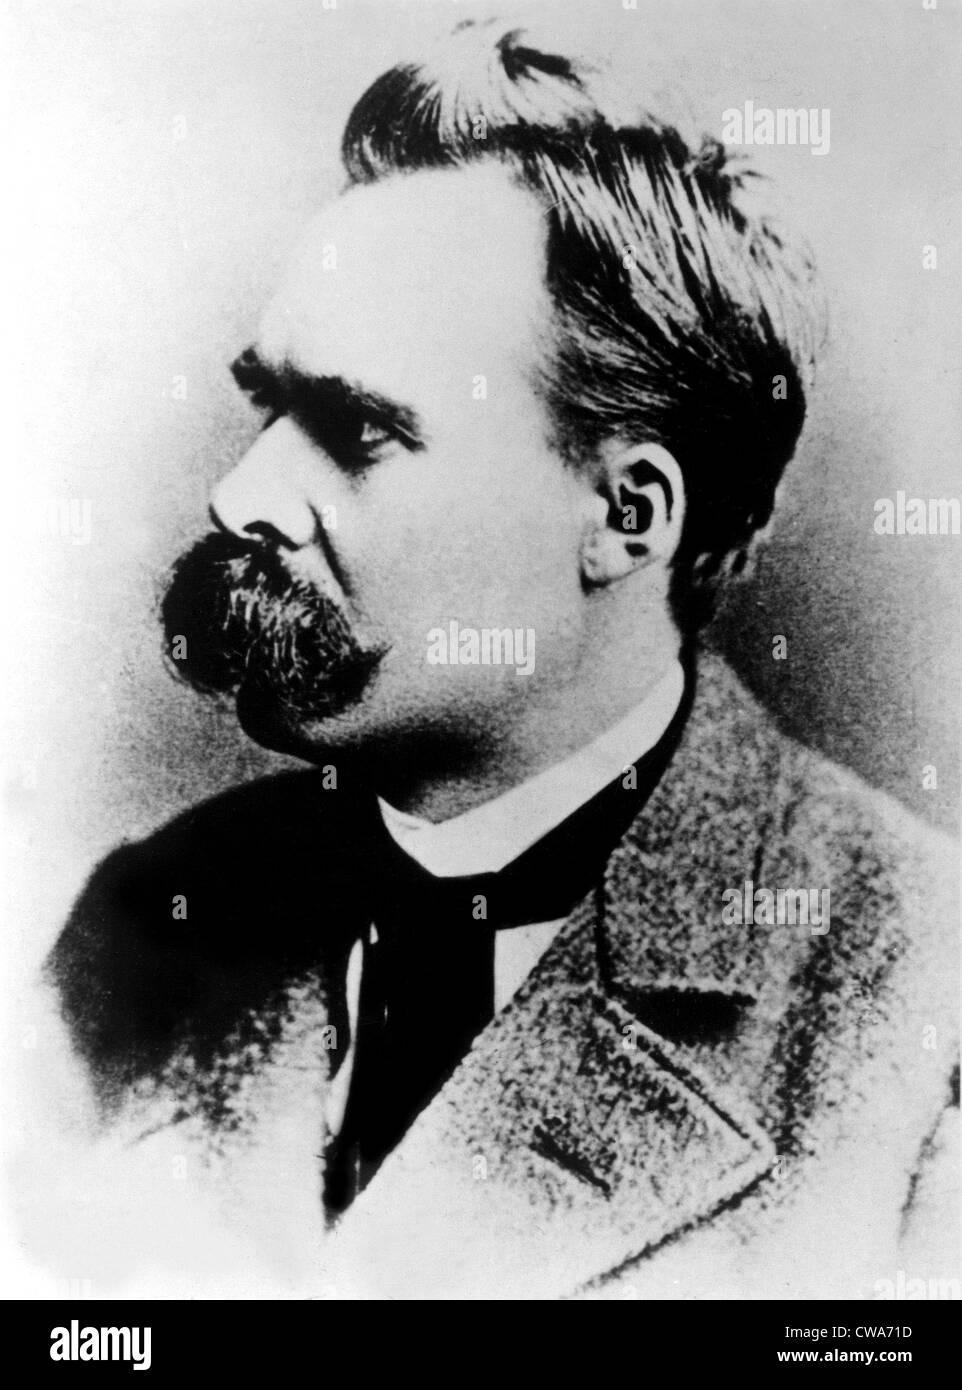 Friedrich Nietzsche, philosophe allemand du xixe siècle, vers 1887. Photo Stock